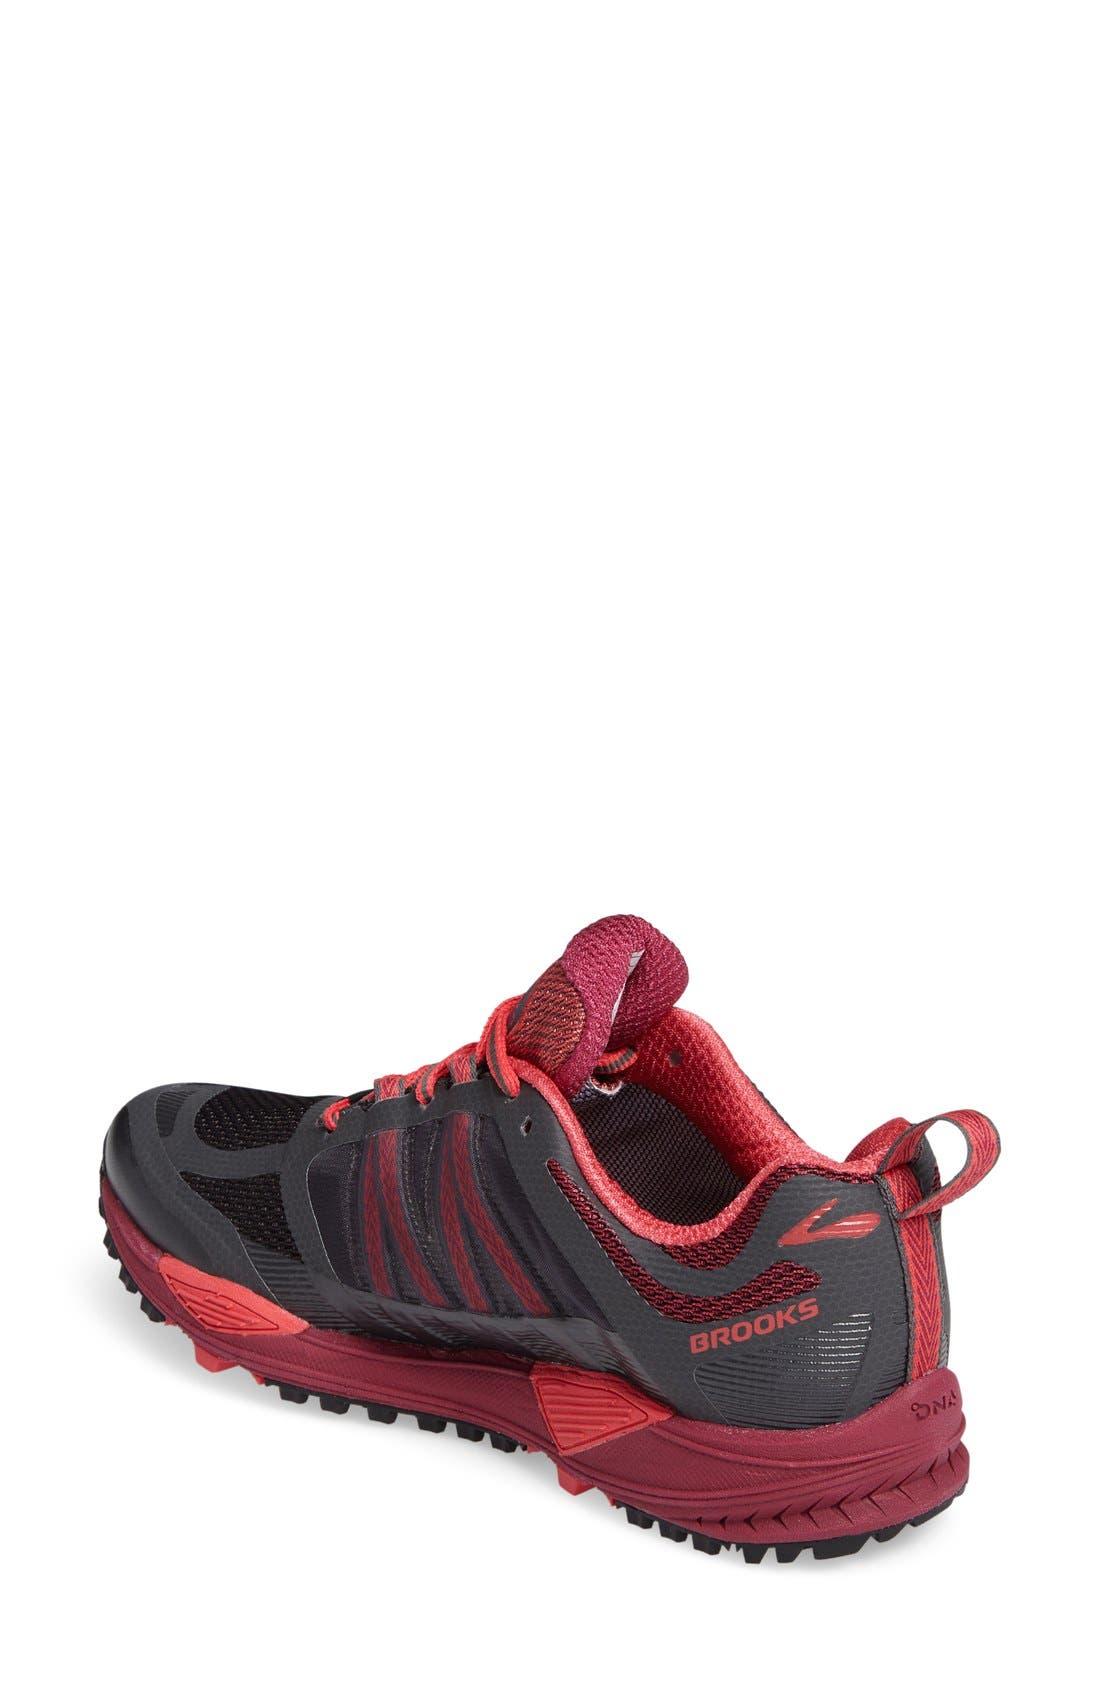 BROOKS,                             Cascadia 11 GTX Trail Running Shoe,                             Alternate thumbnail 4, color,                             020